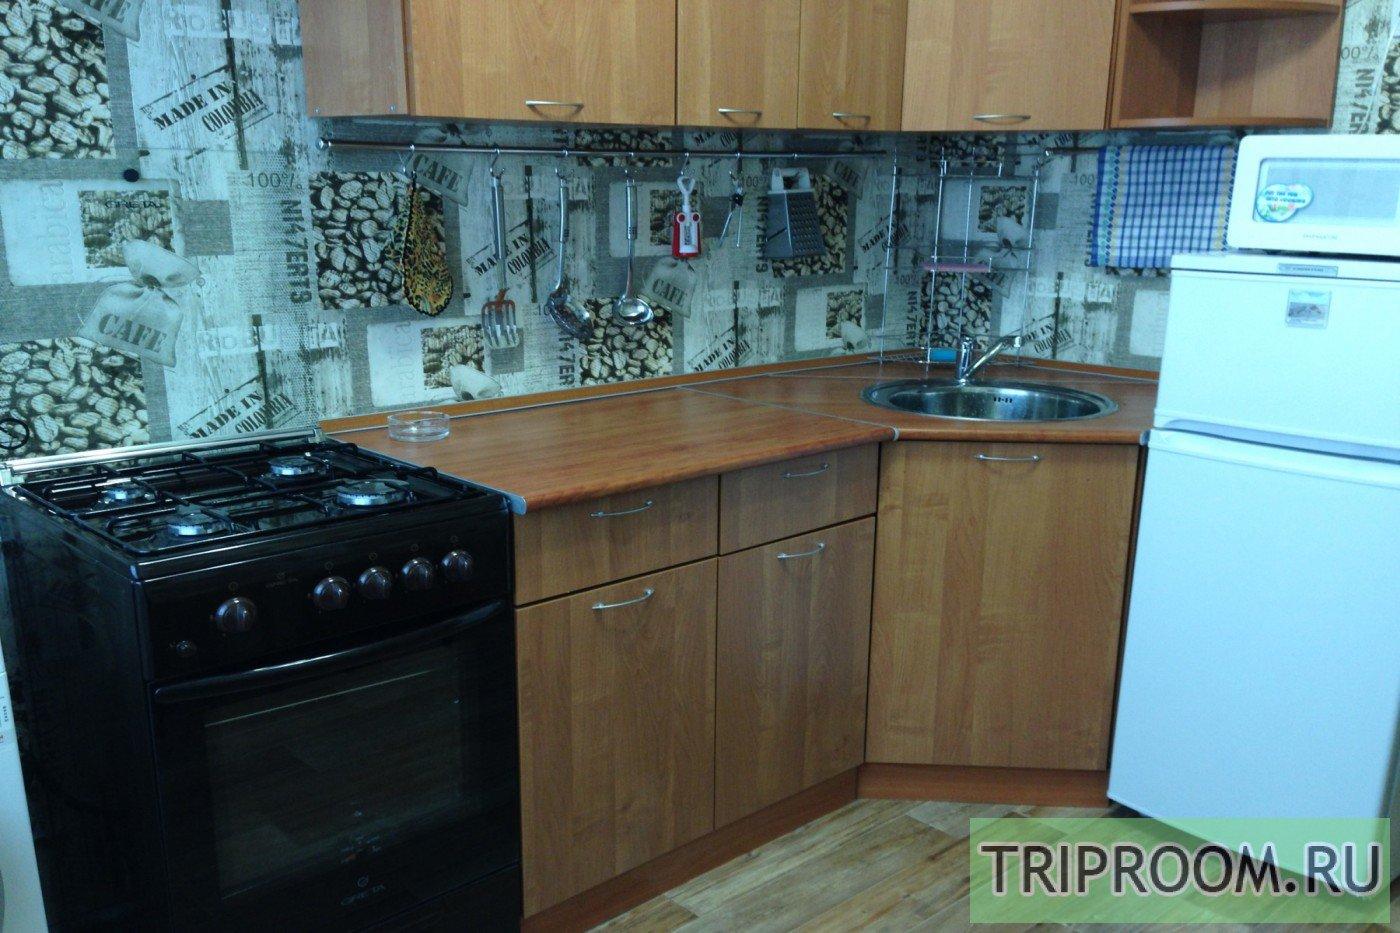 1-комнатная квартира посуточно (вариант № 20610), ул. Титова улица, фото № 5